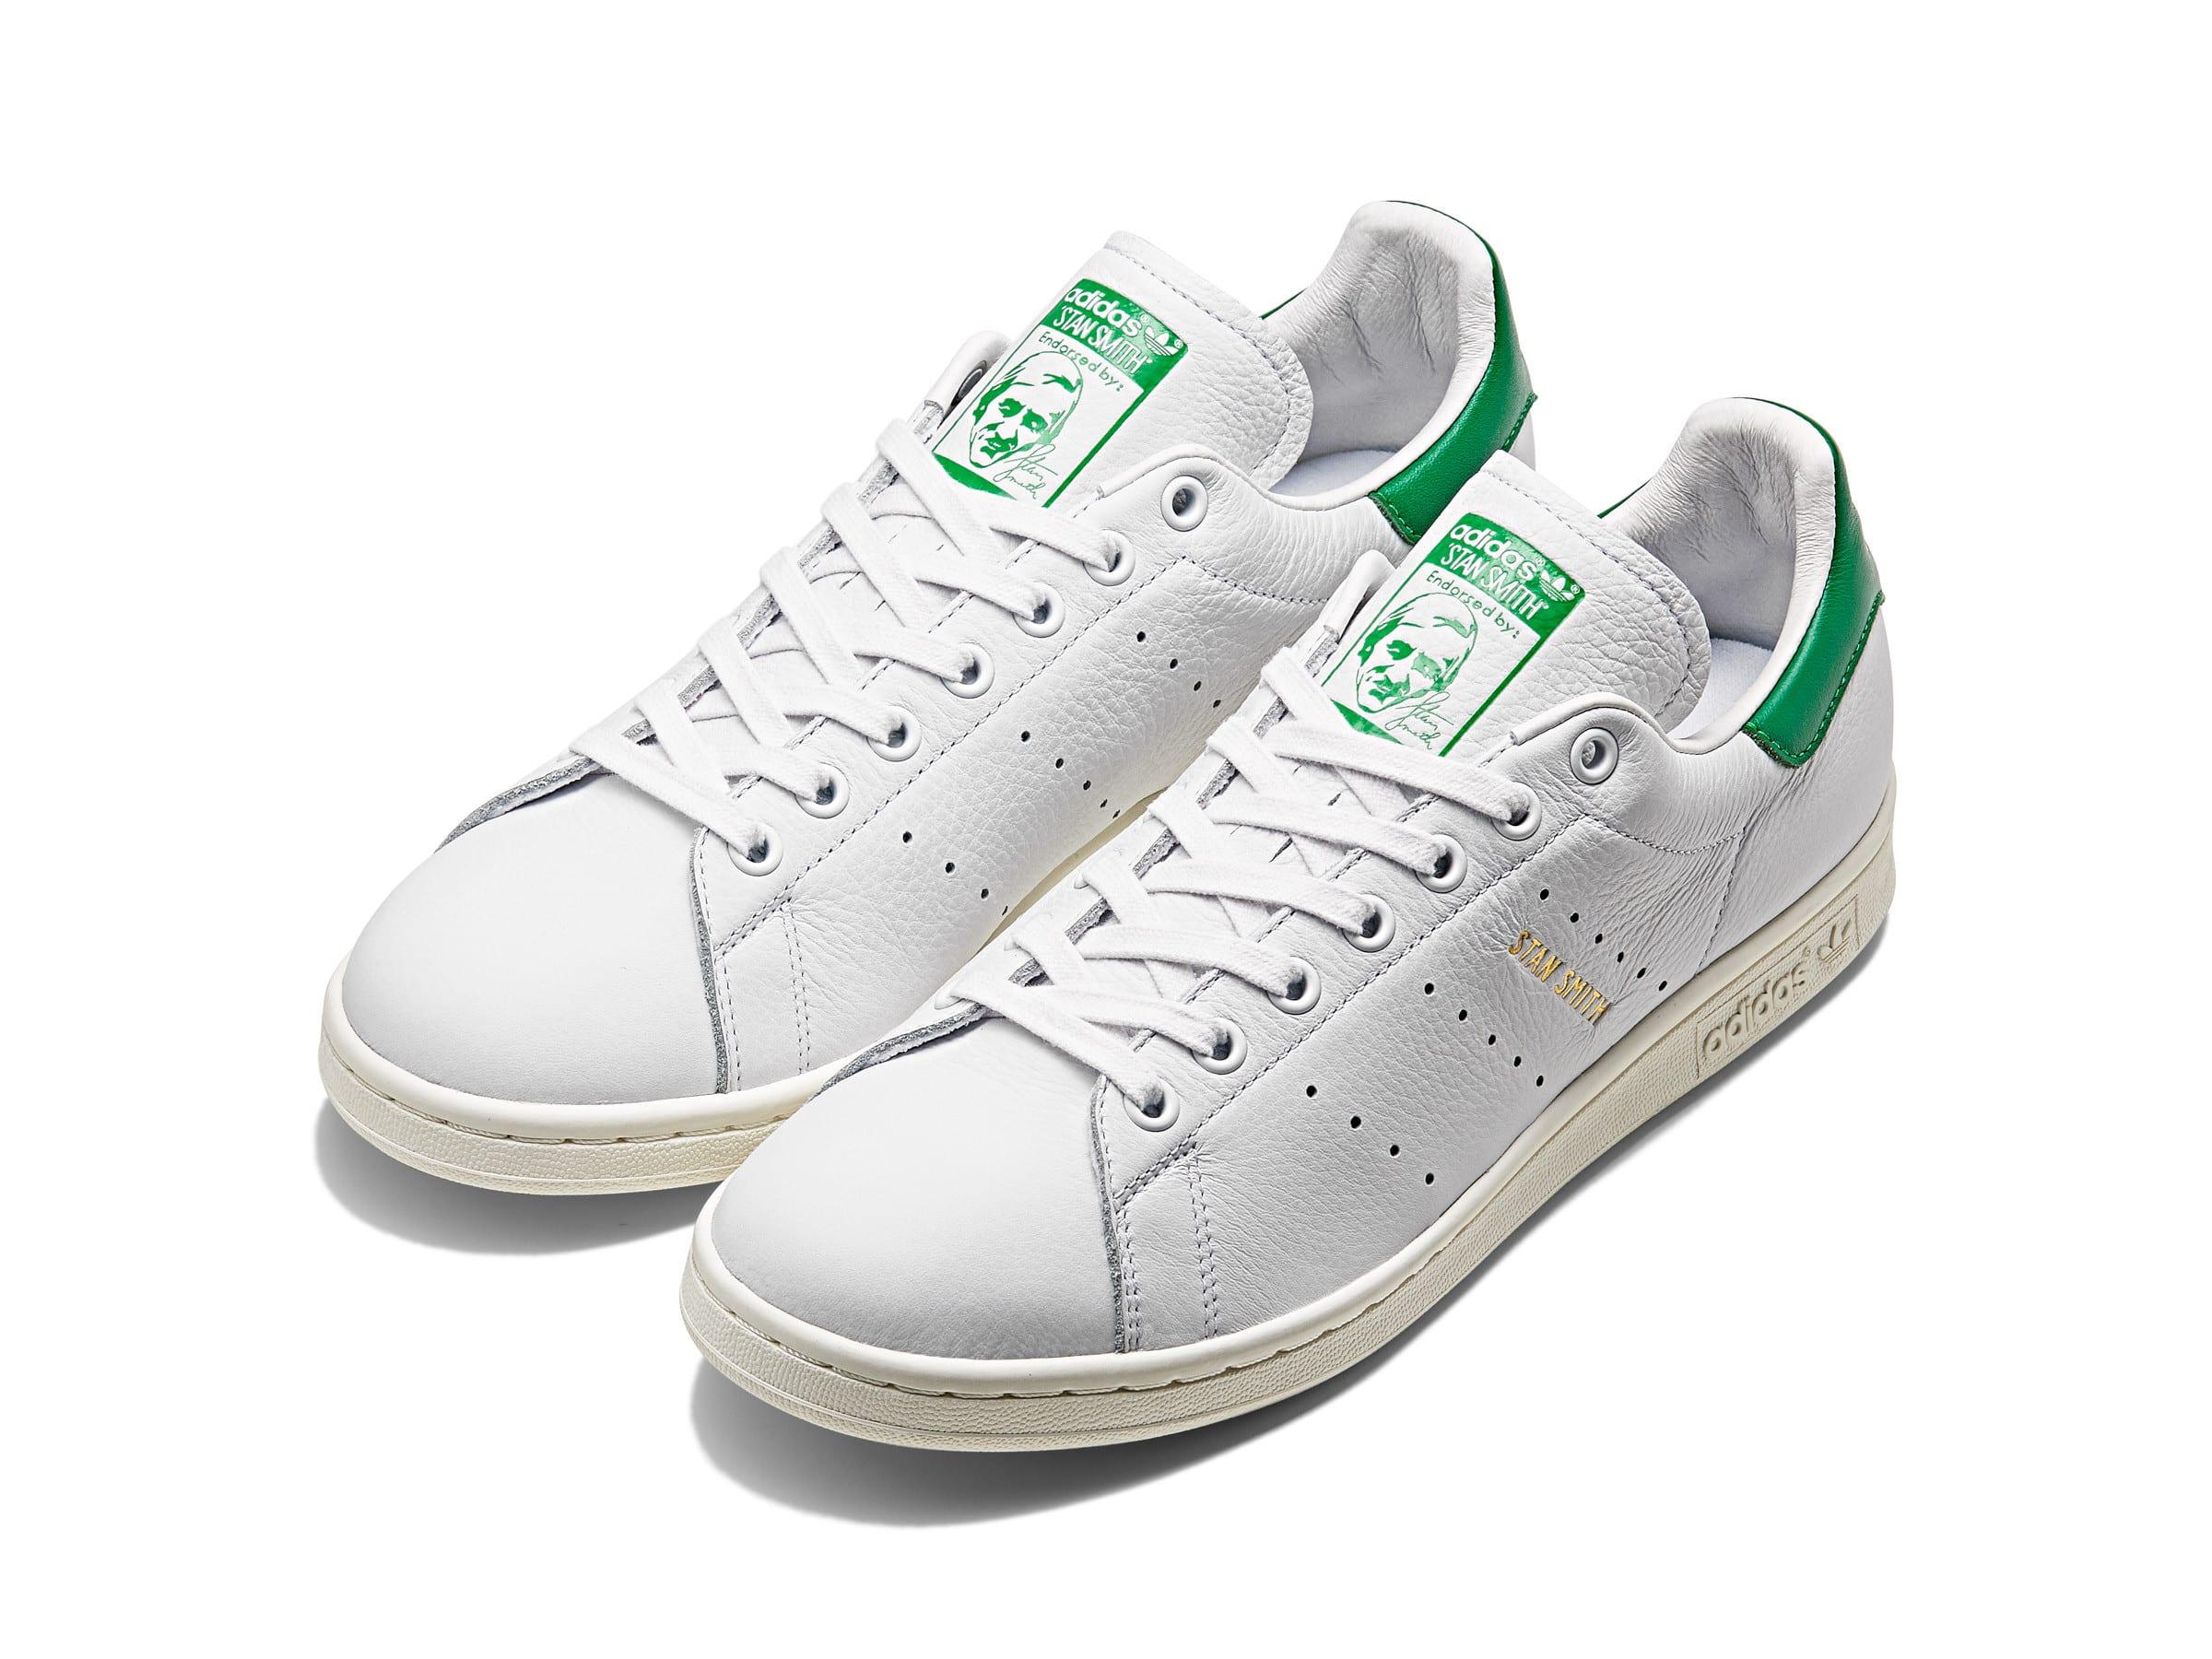 e6a9beee8b32a 「アディダス オリジナルス(adidas Originals)」が2019年春夏シーズンの新作として、元プロテニスプレーヤーのスタン・スミスとの終身契約を記念した限定  ...